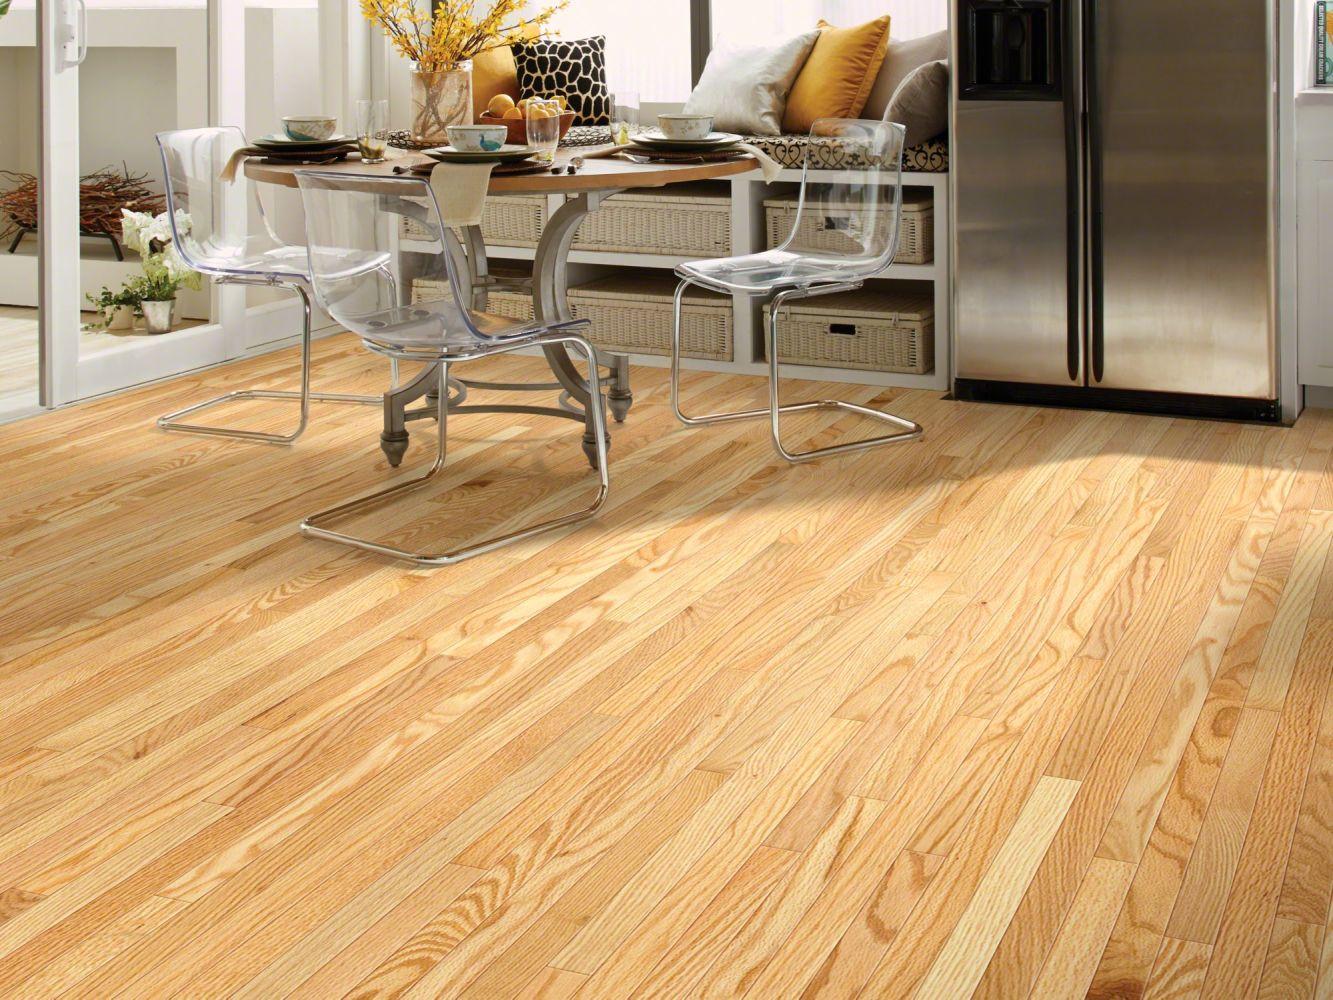 Shaw Floors Nfa Premier Gallery Hardwood Edenwild 2.25 Red Oak Natural 00700_VH029